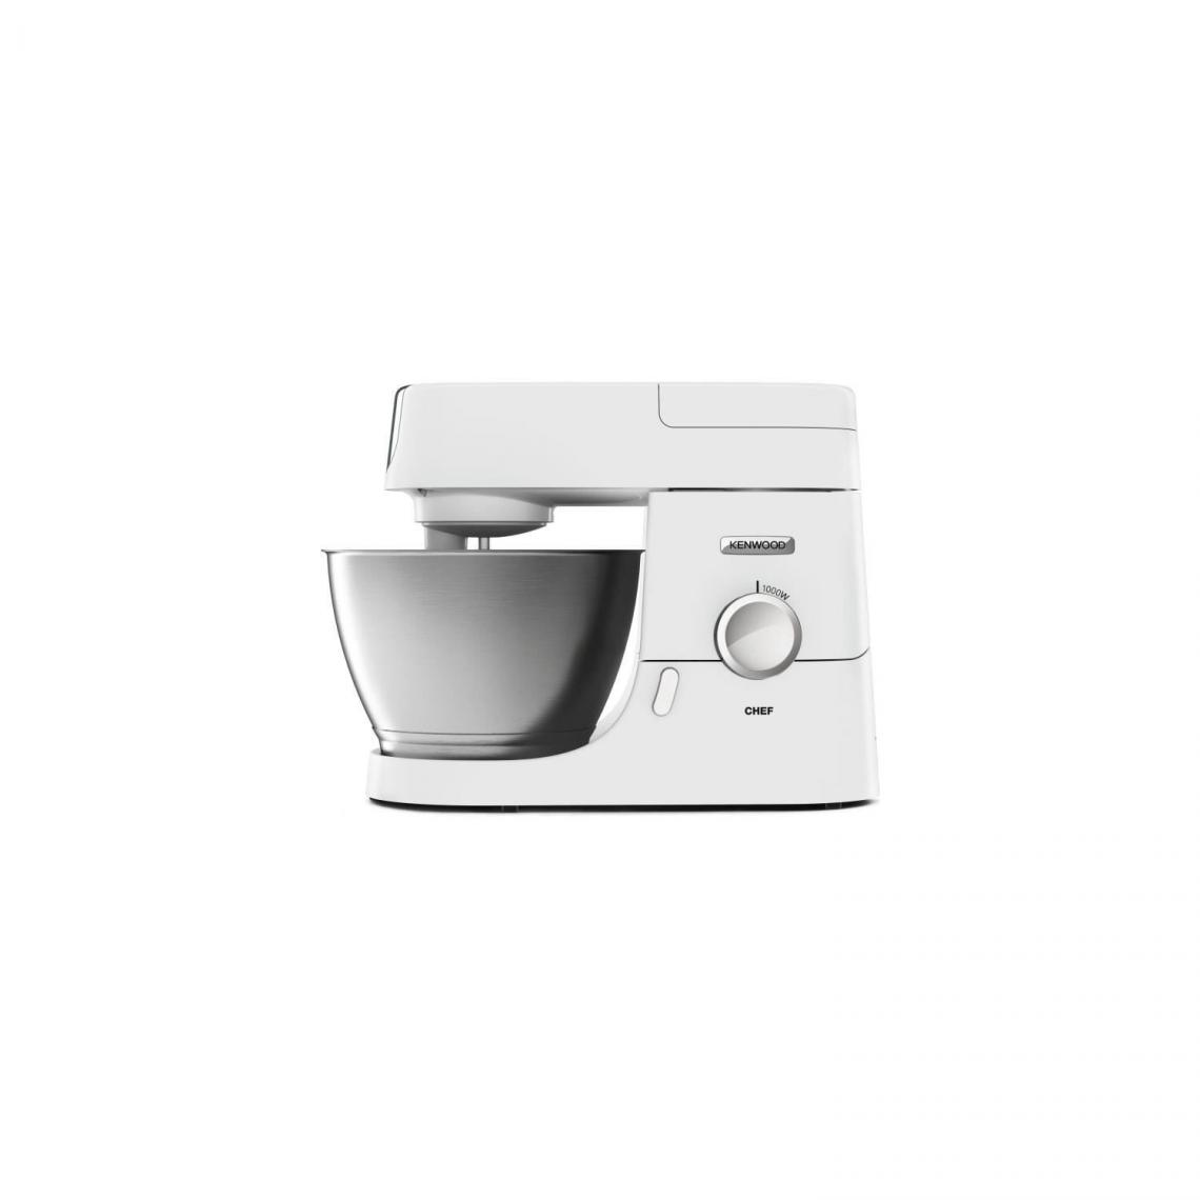 Kenwood KENWOOD KVC3173W - Machine a cuisine Chef - 1000 W - Bol 4,6L